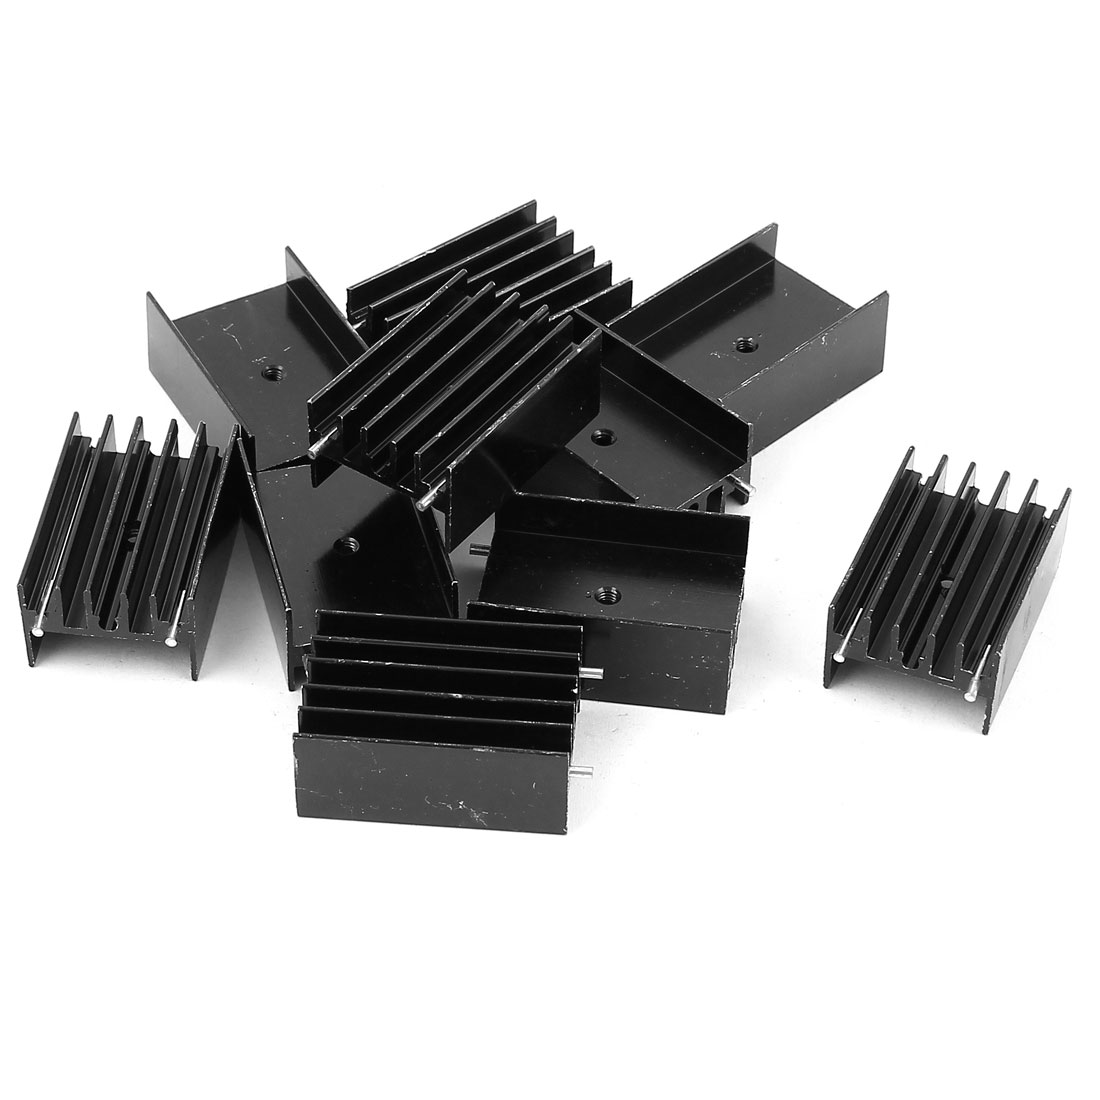 10 Pcs 35mmx23mmx16mm Black Aluminum Heatsinks Radiator + Needles for Mosfet IC